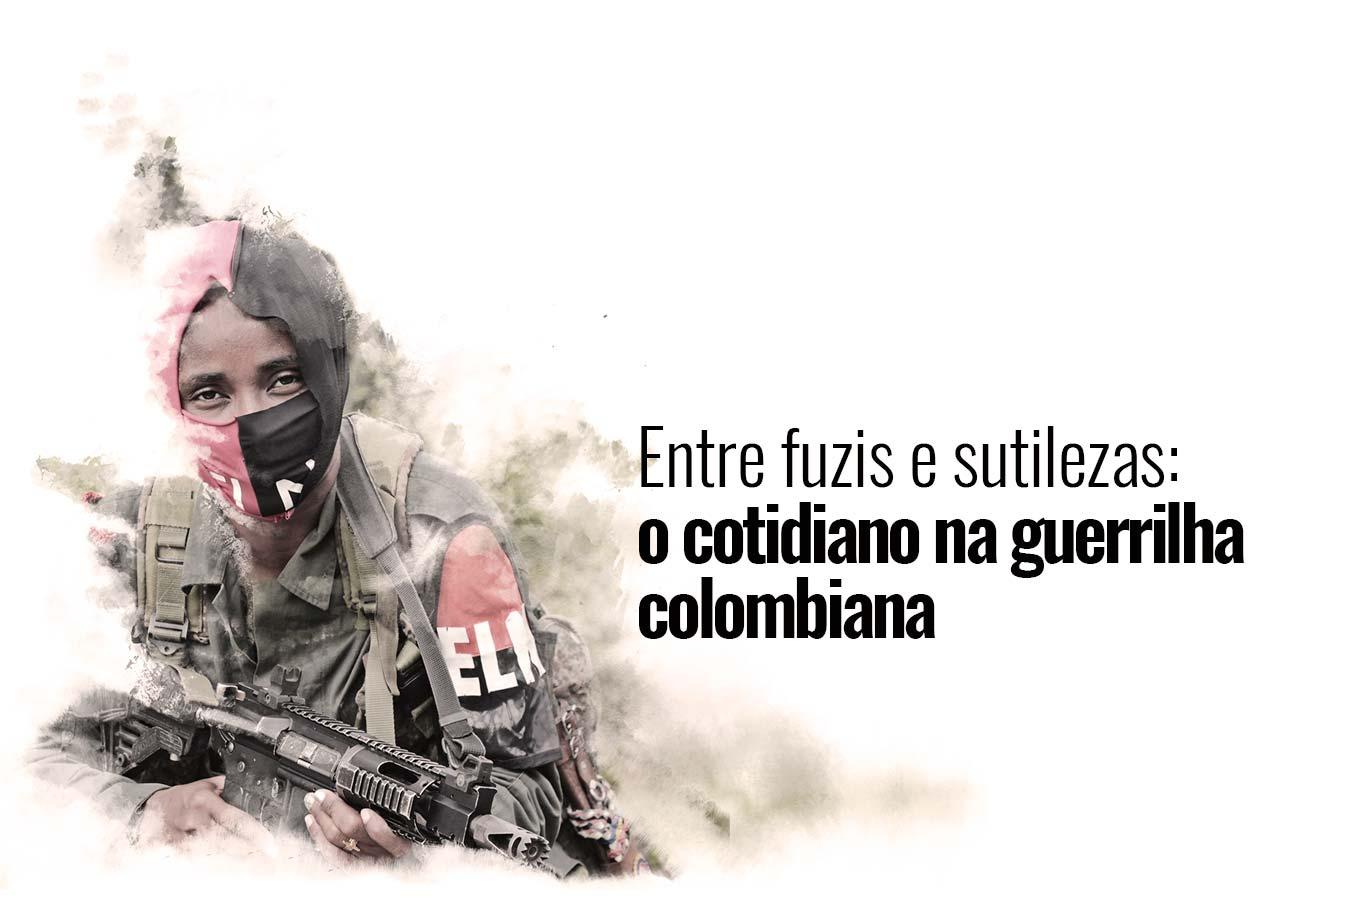 Confira a segunda crônica da guerrilha colombiana